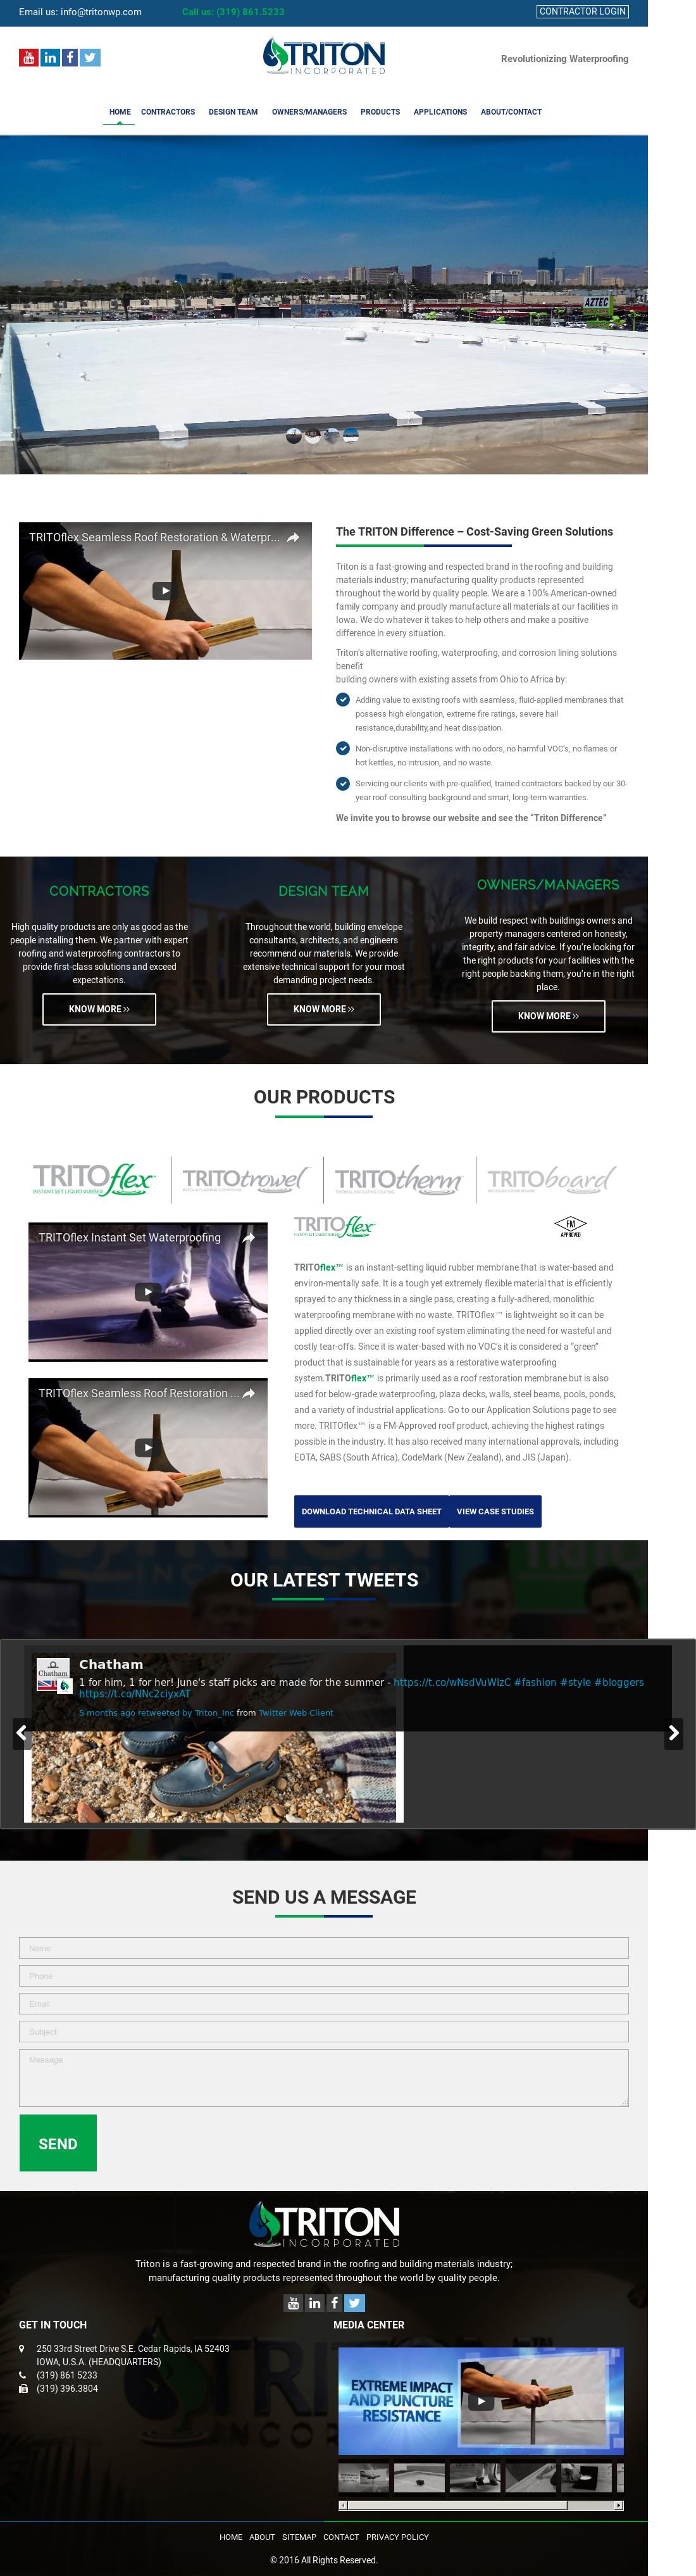 Tritonwp Competitors, Revenue and Employees - Owler Company Profile